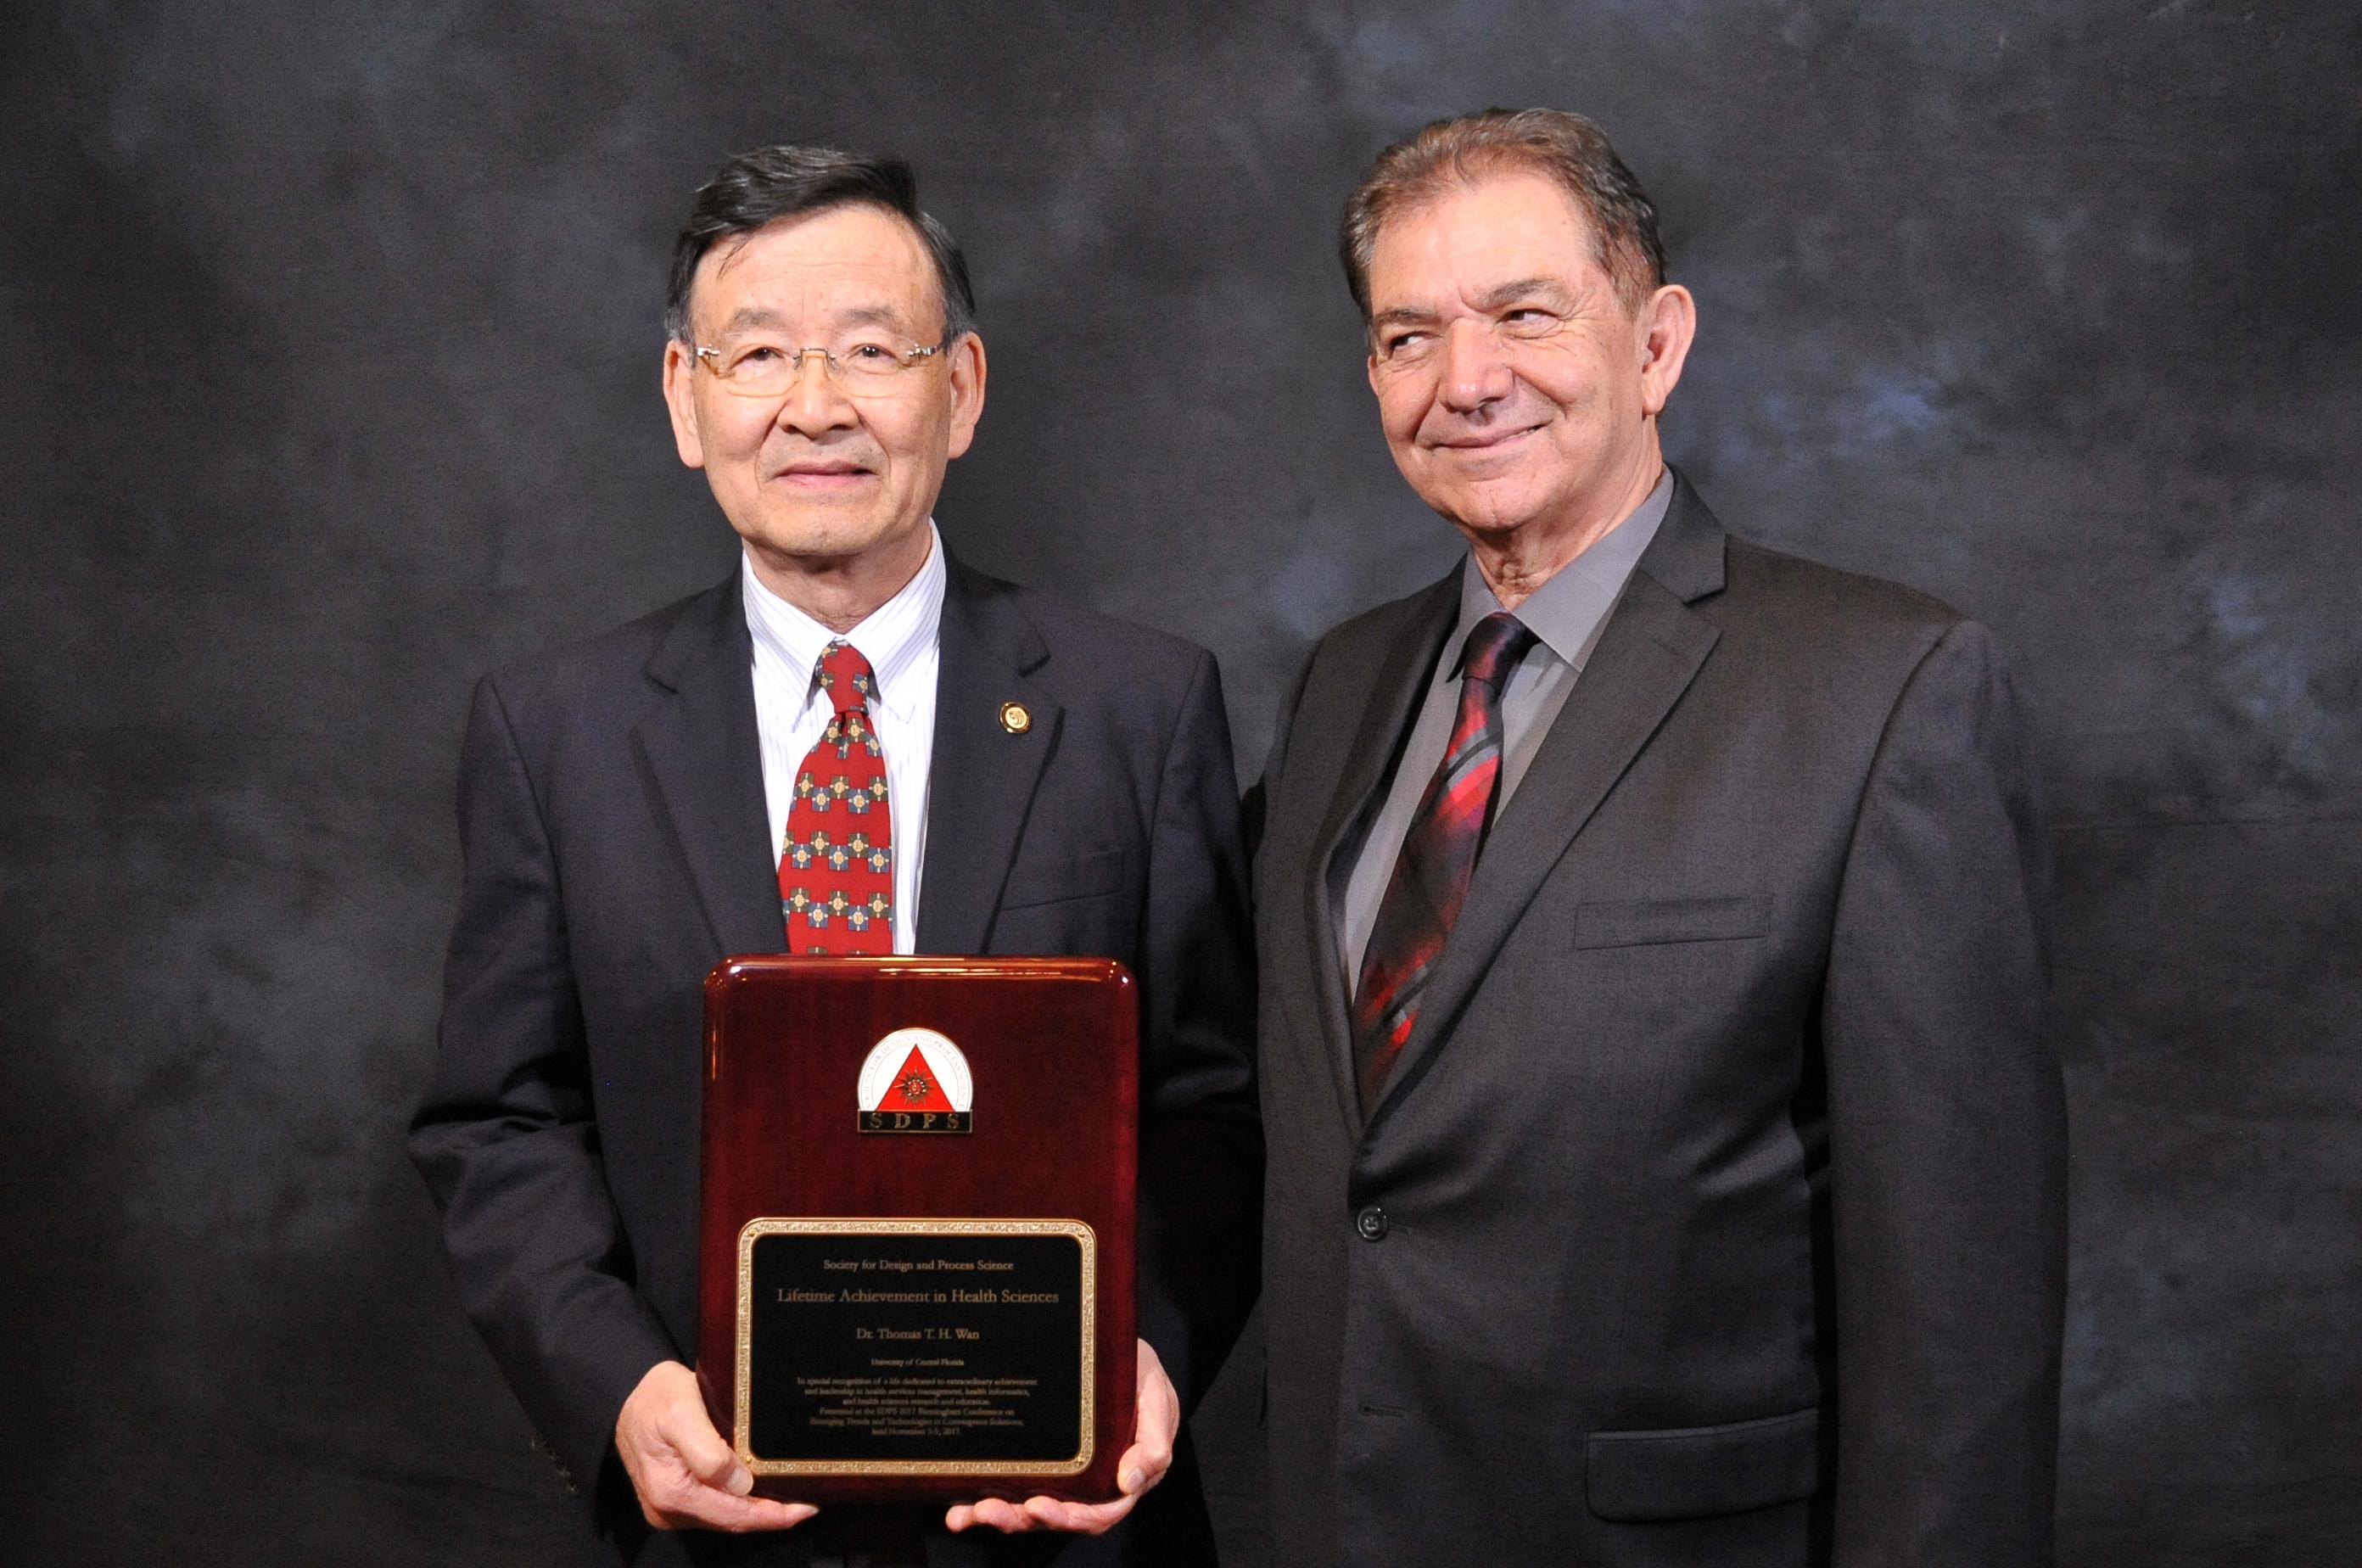 A participant receives a lifetime achievement award during this Nashville Red Carpet Photography event